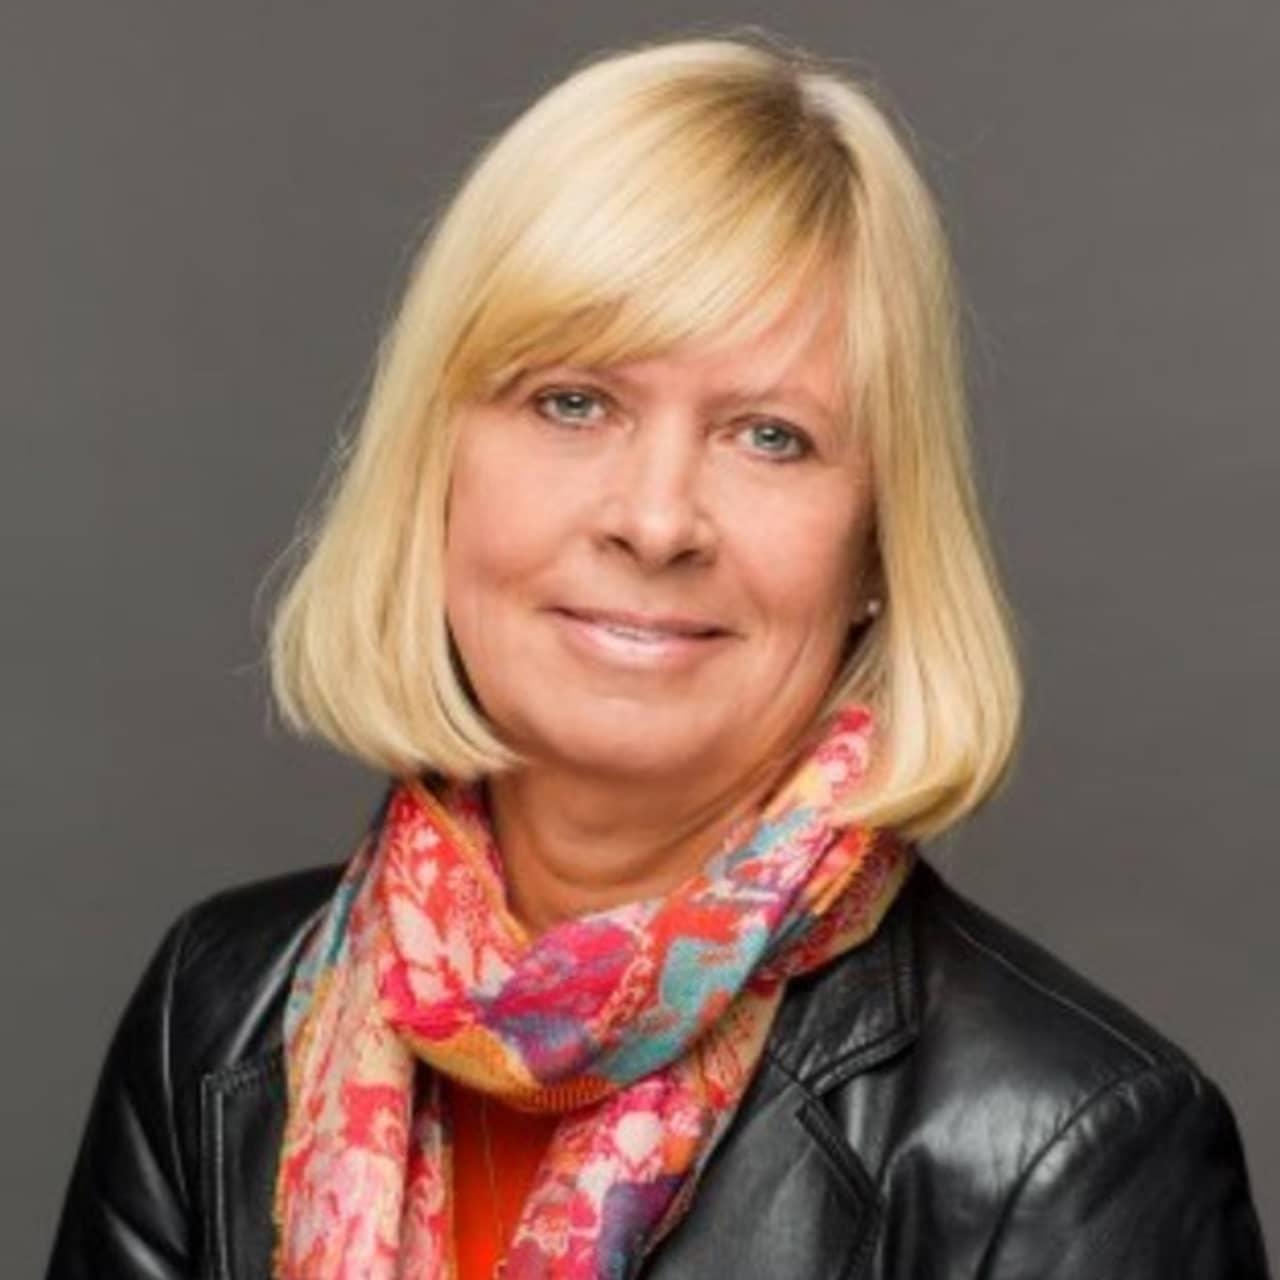 83. Gunilla Hult Backlund